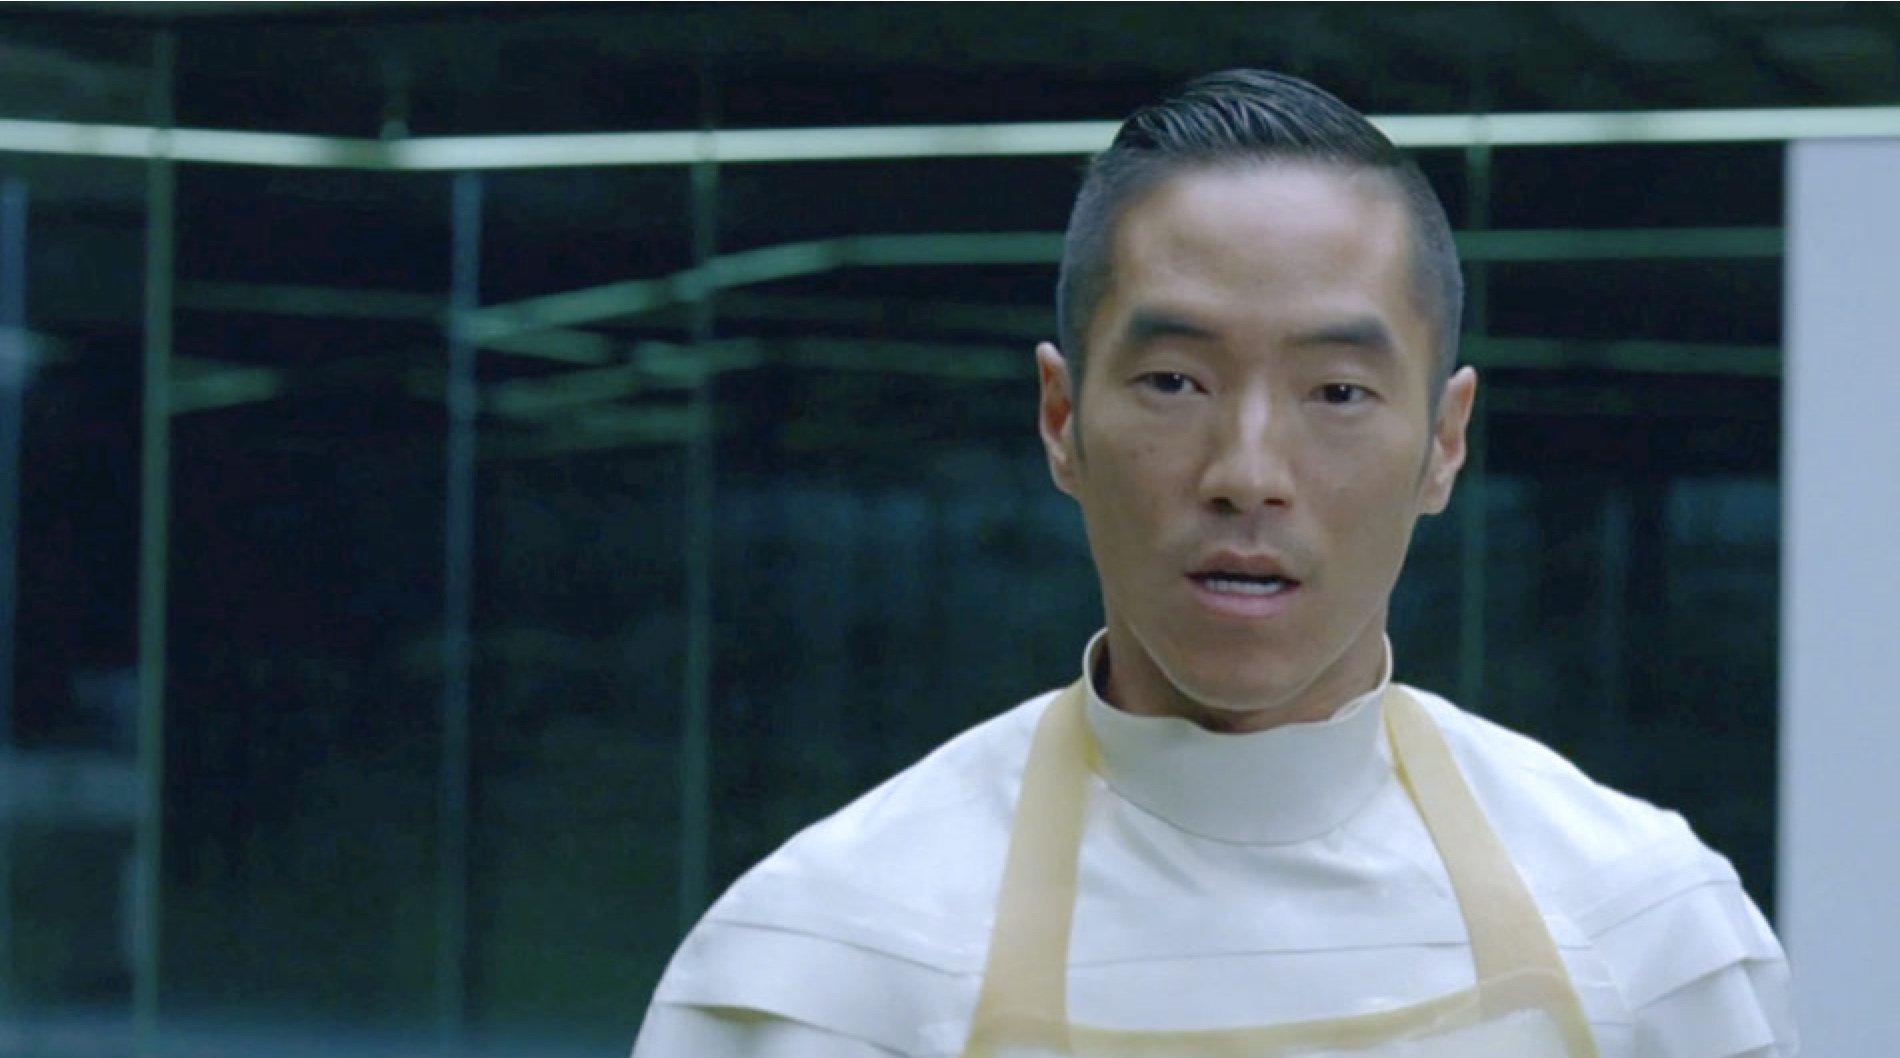 Westworld's Leonardo Nam Cast In Important Swamp Thing Role